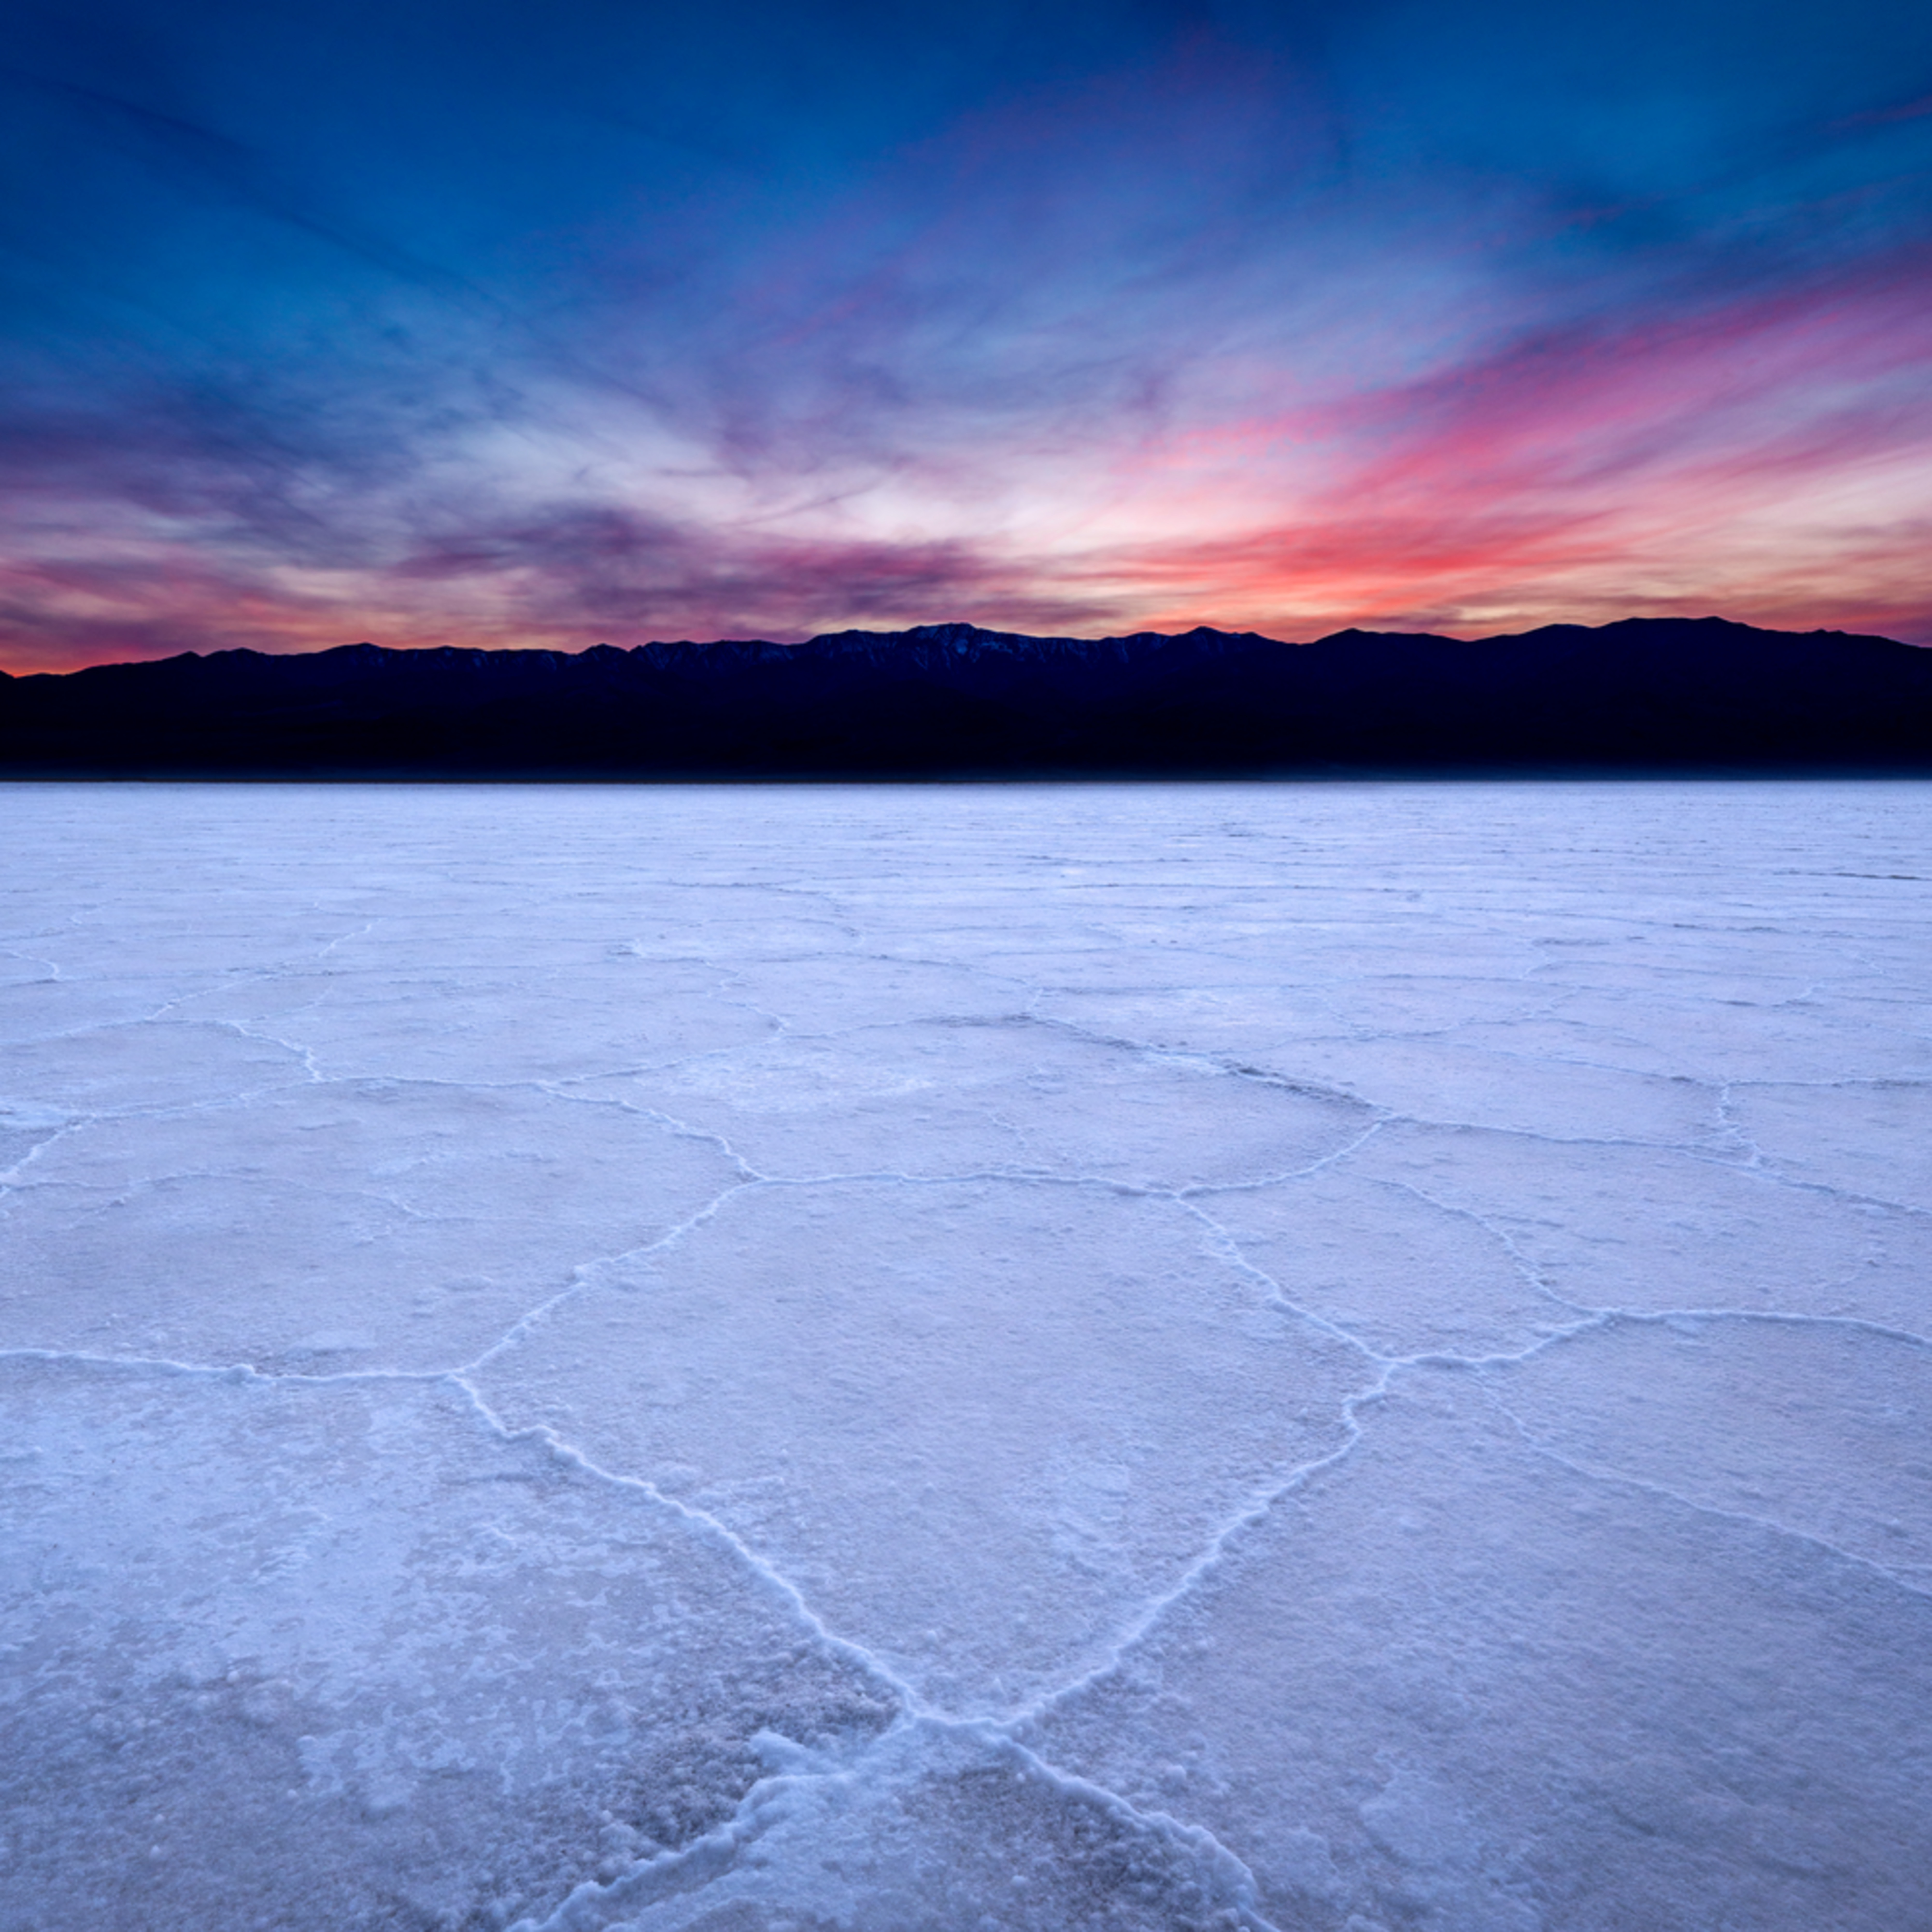 Badwater sunset ftiumi